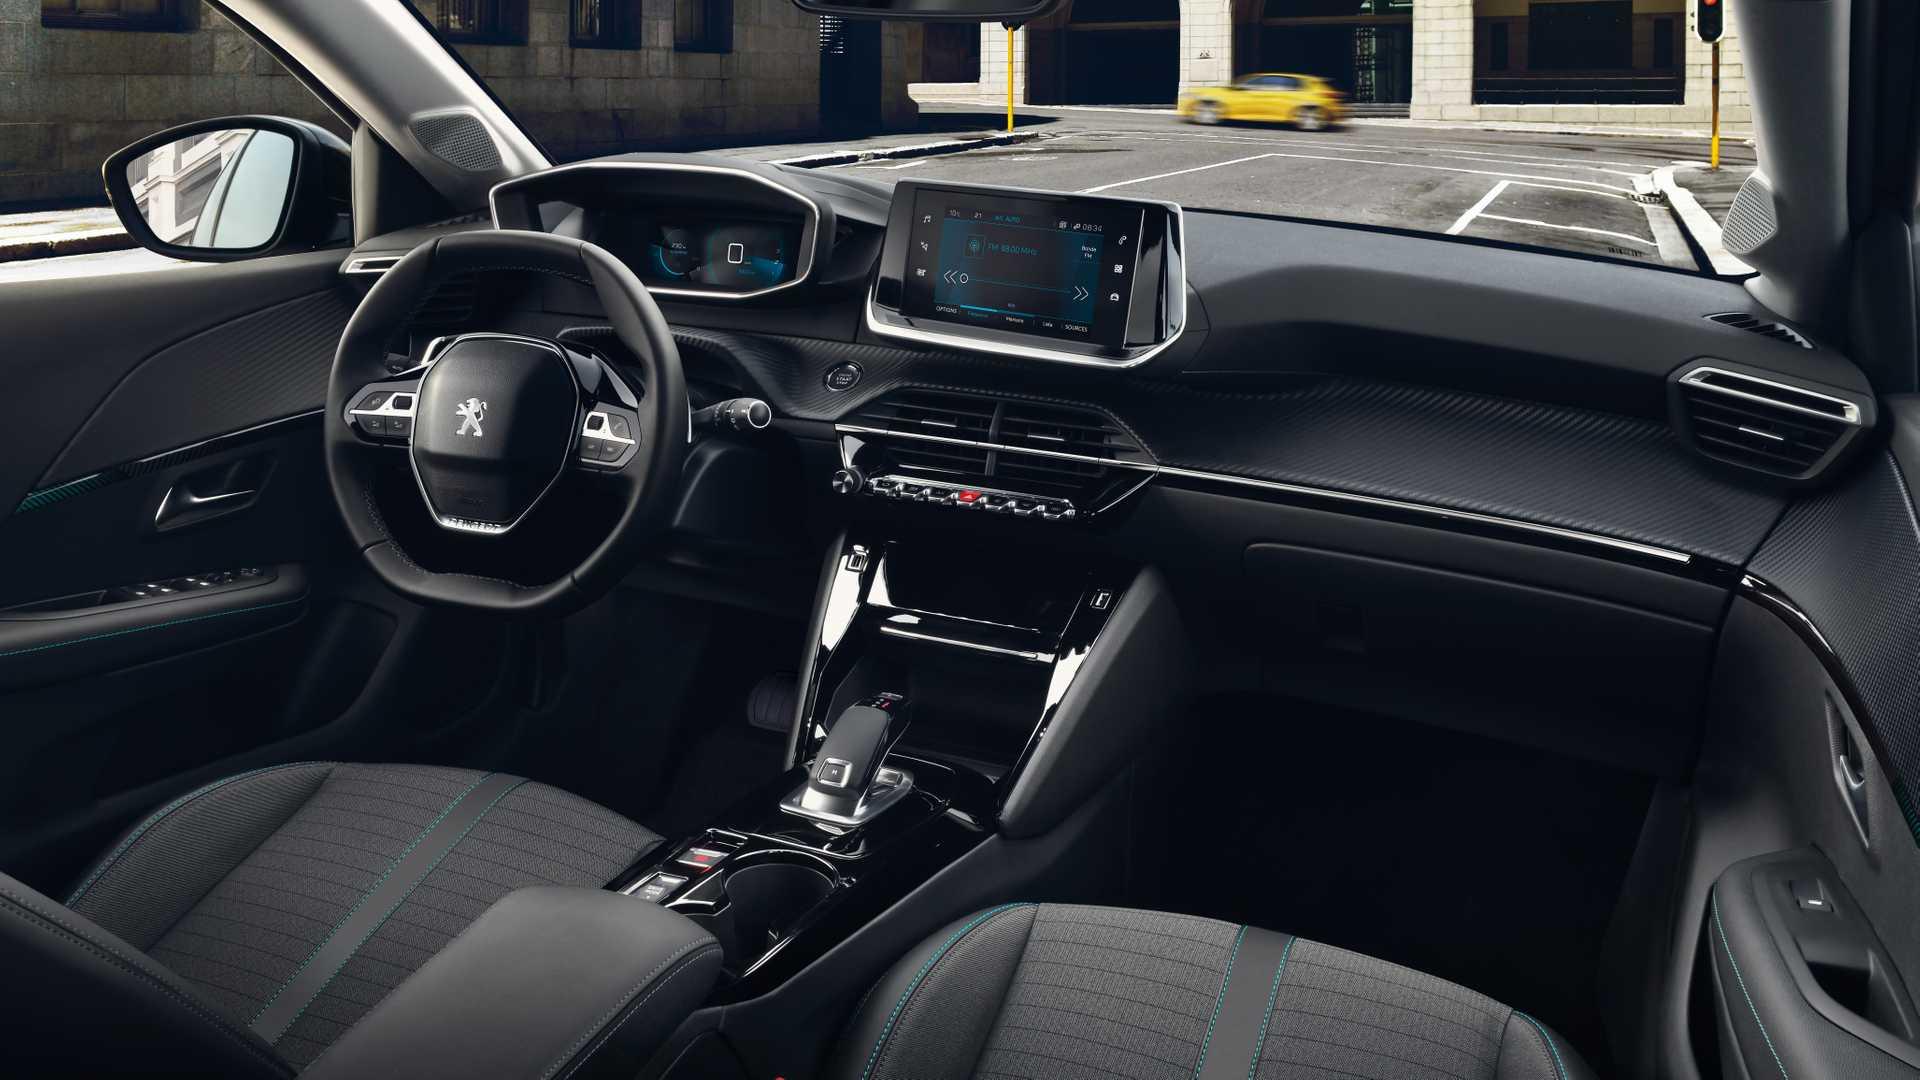 2020 Peugeot 208 Interior Cockpit Wallpapers (7)